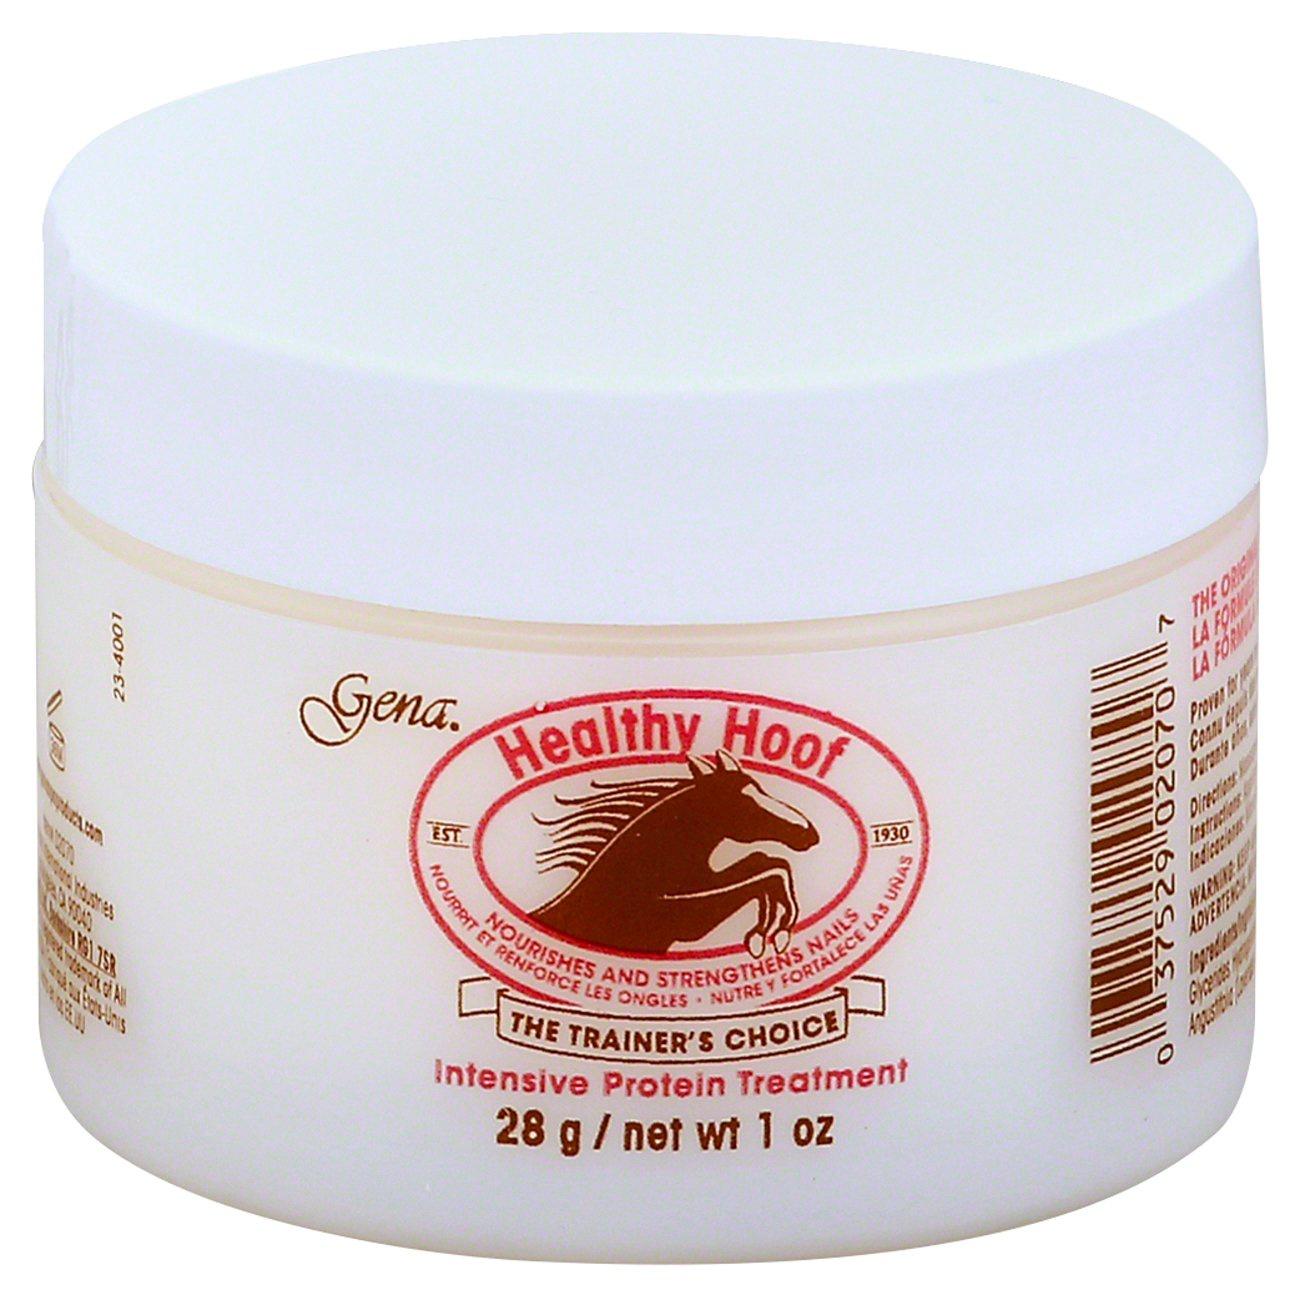 Gena Healthy Hoof Intensive Protein Treatment Cream